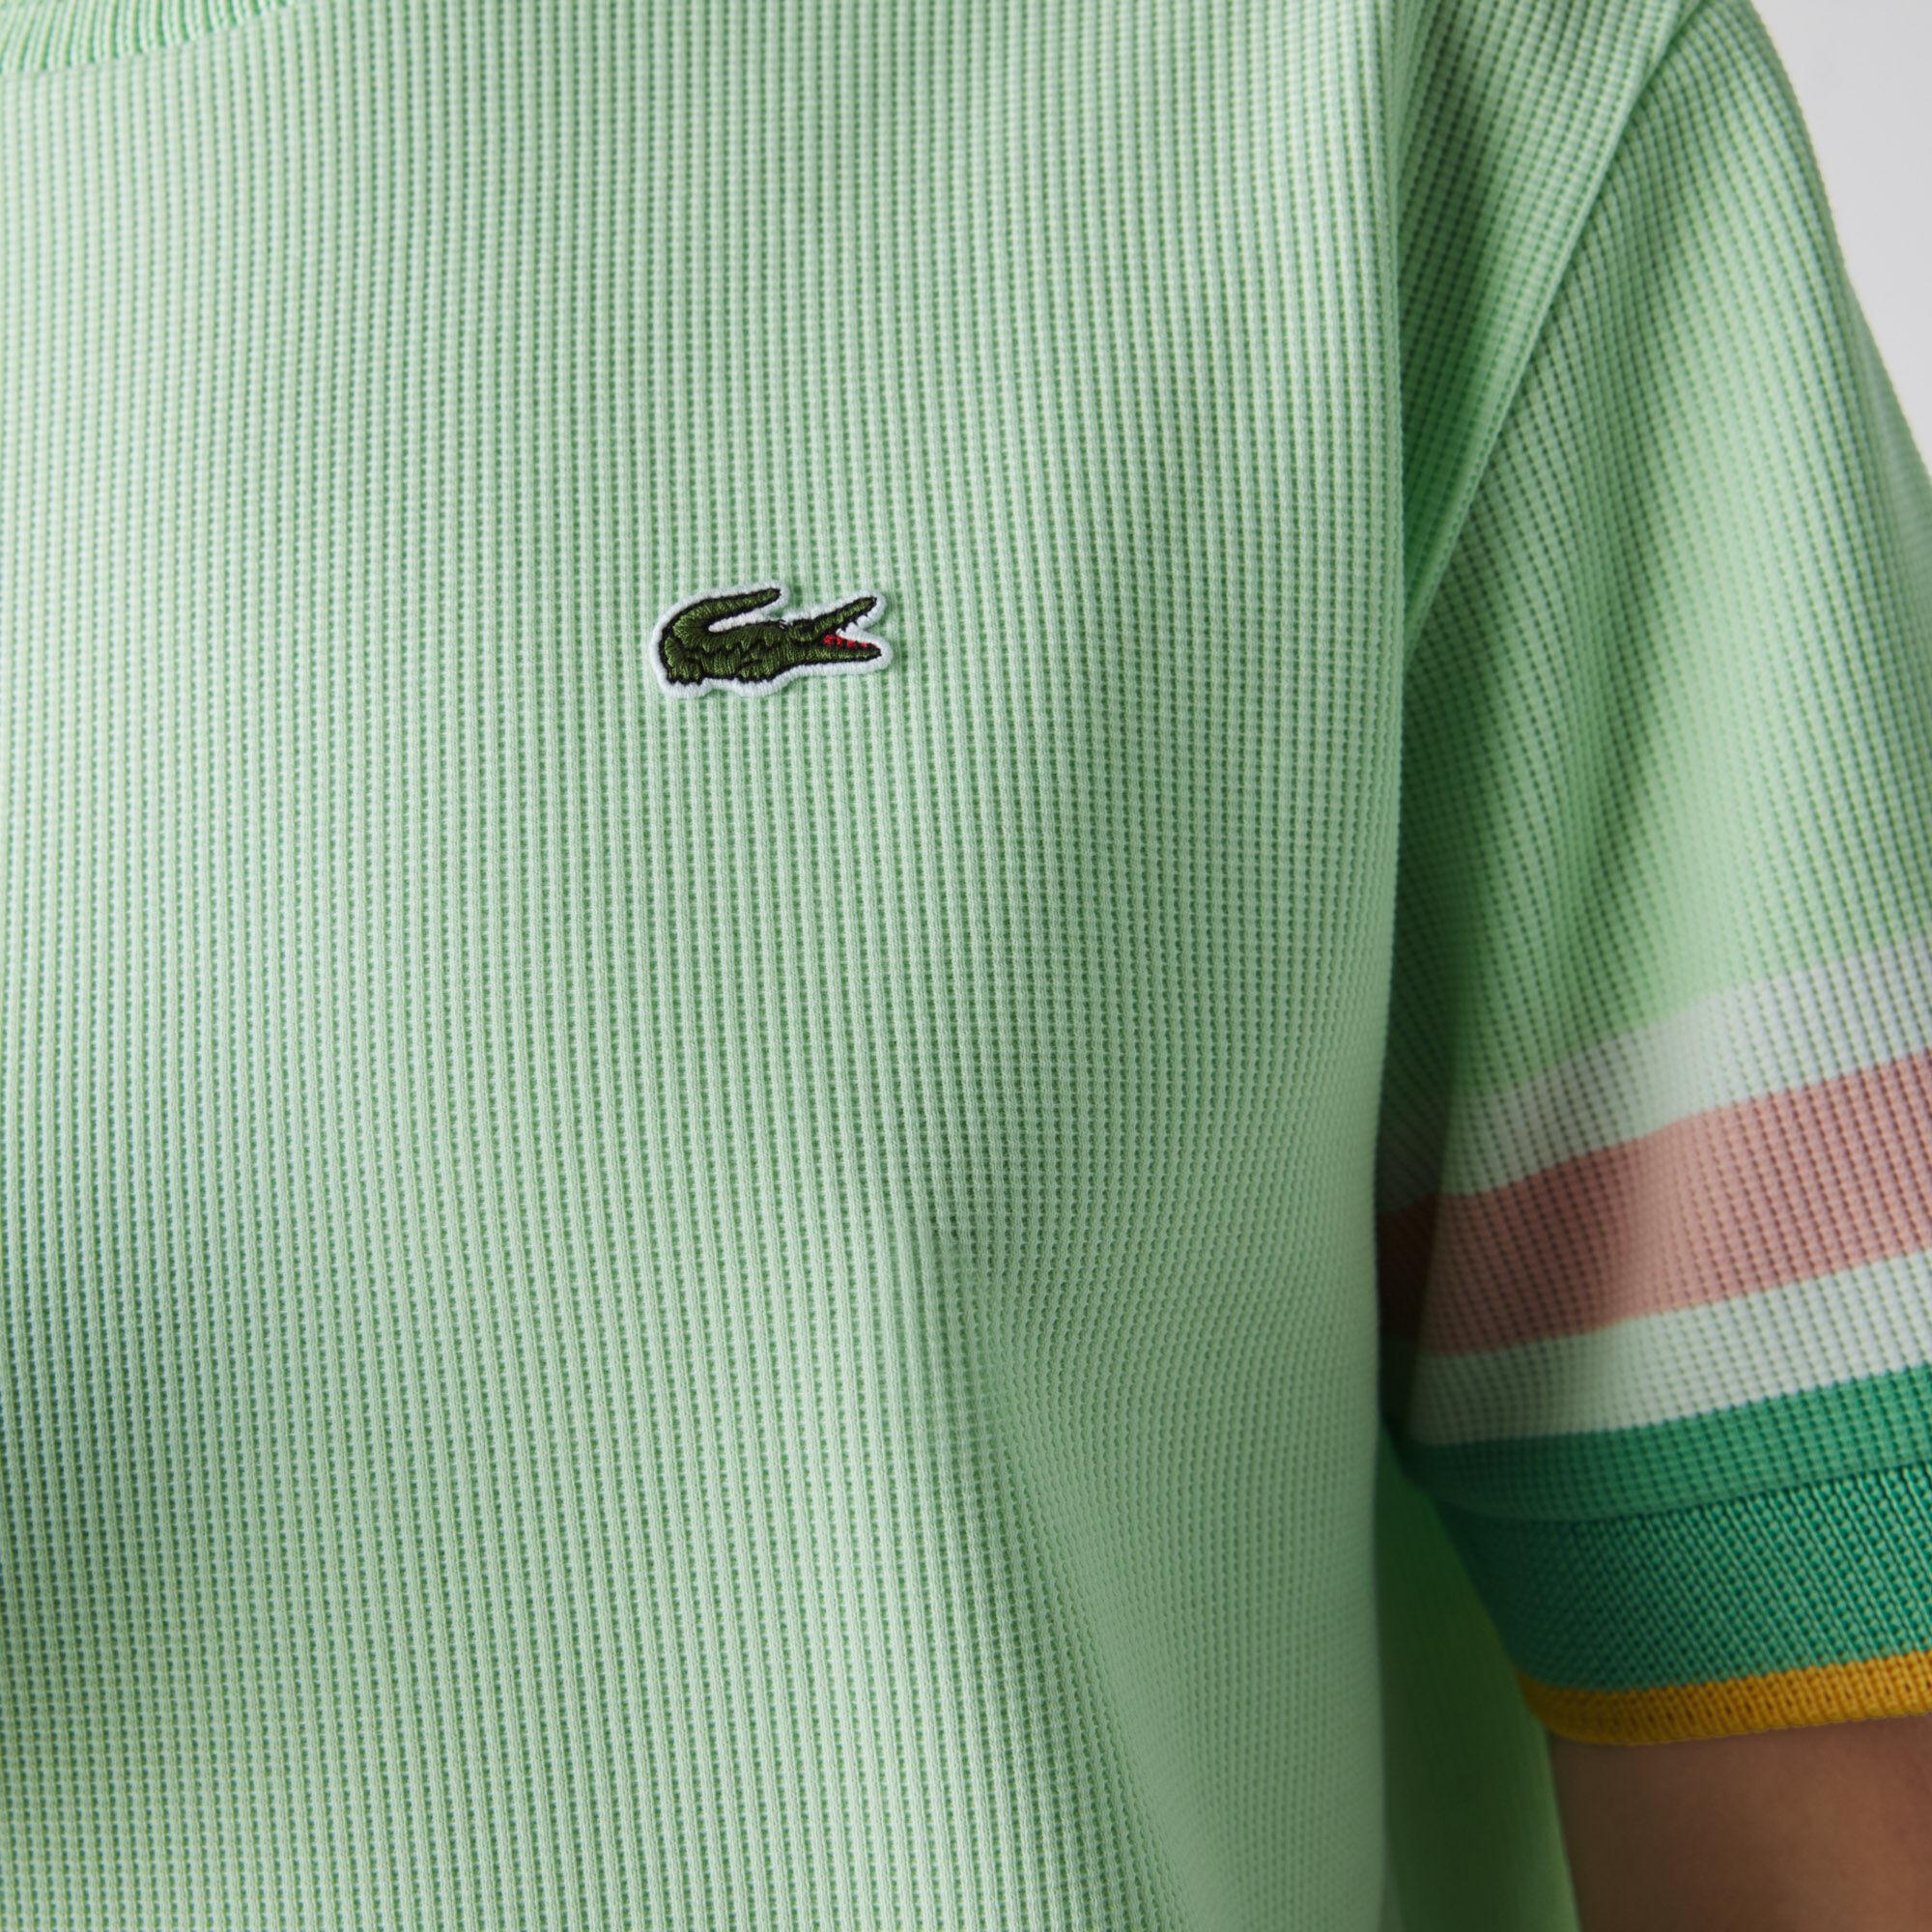 Women's Crew Neck Striped Accents Honeycomb Cotton T-shirt